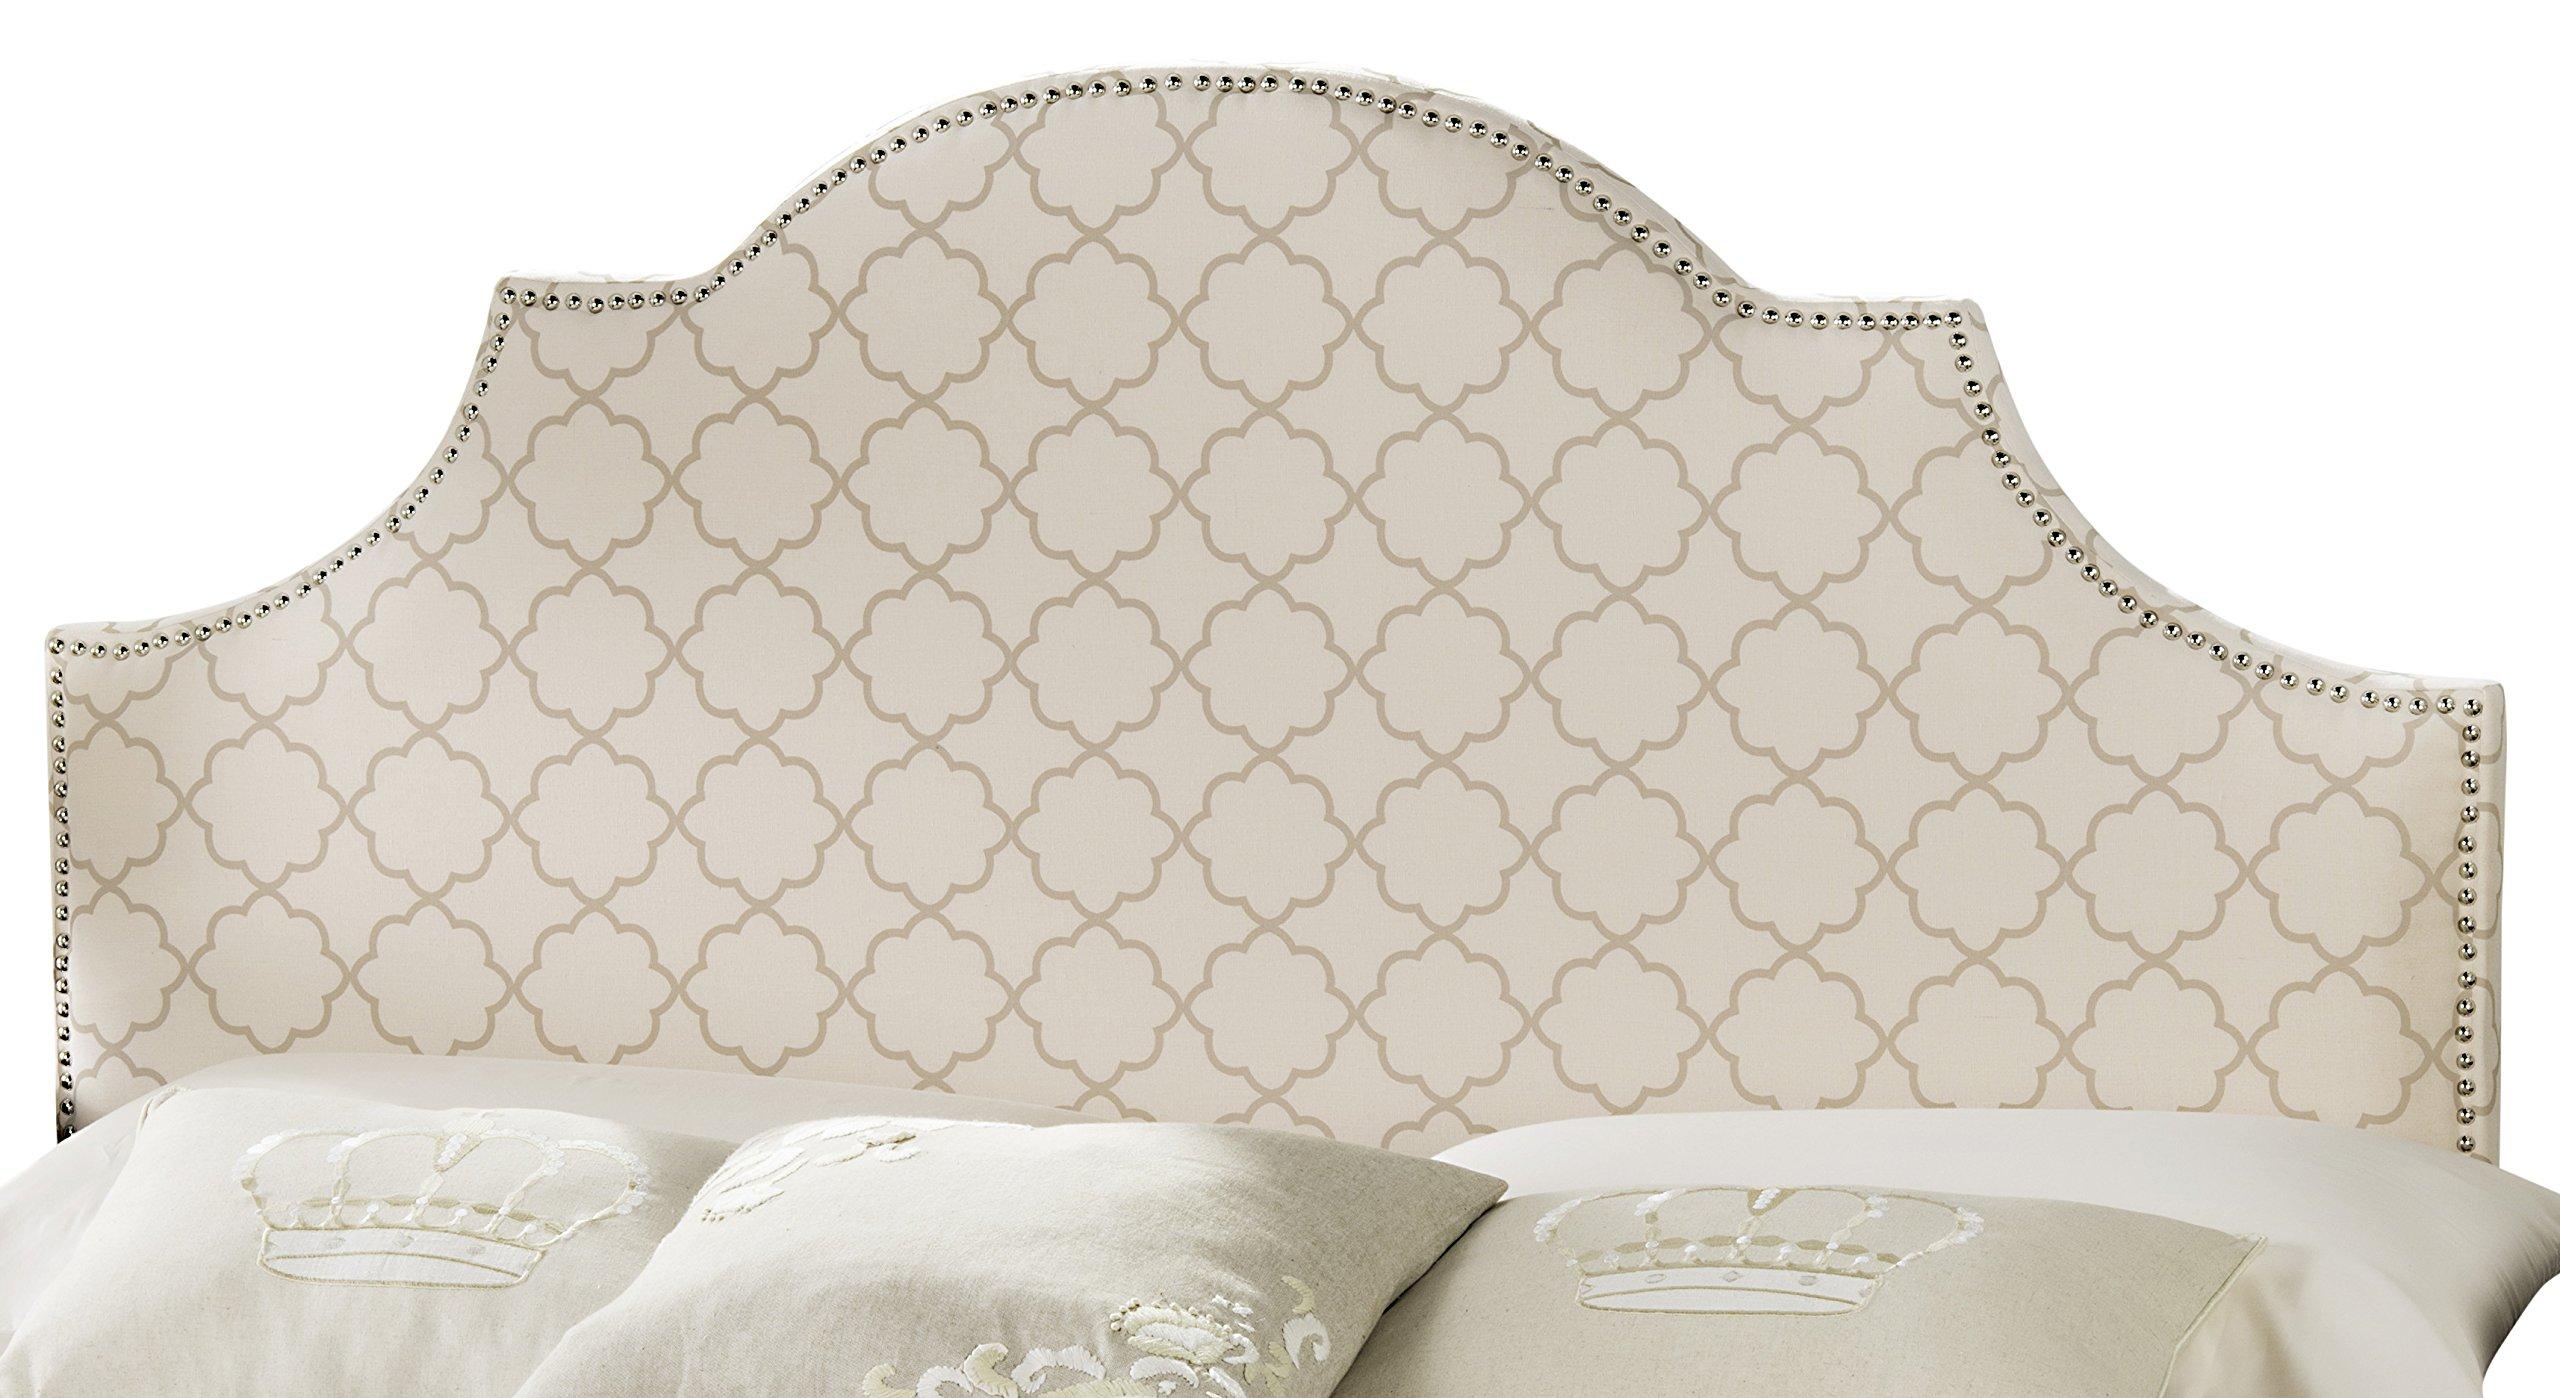 Safavieh Hallmar Pale Pink/ Beige Upholstered Arched Headboard - Silver Nailhead (King)